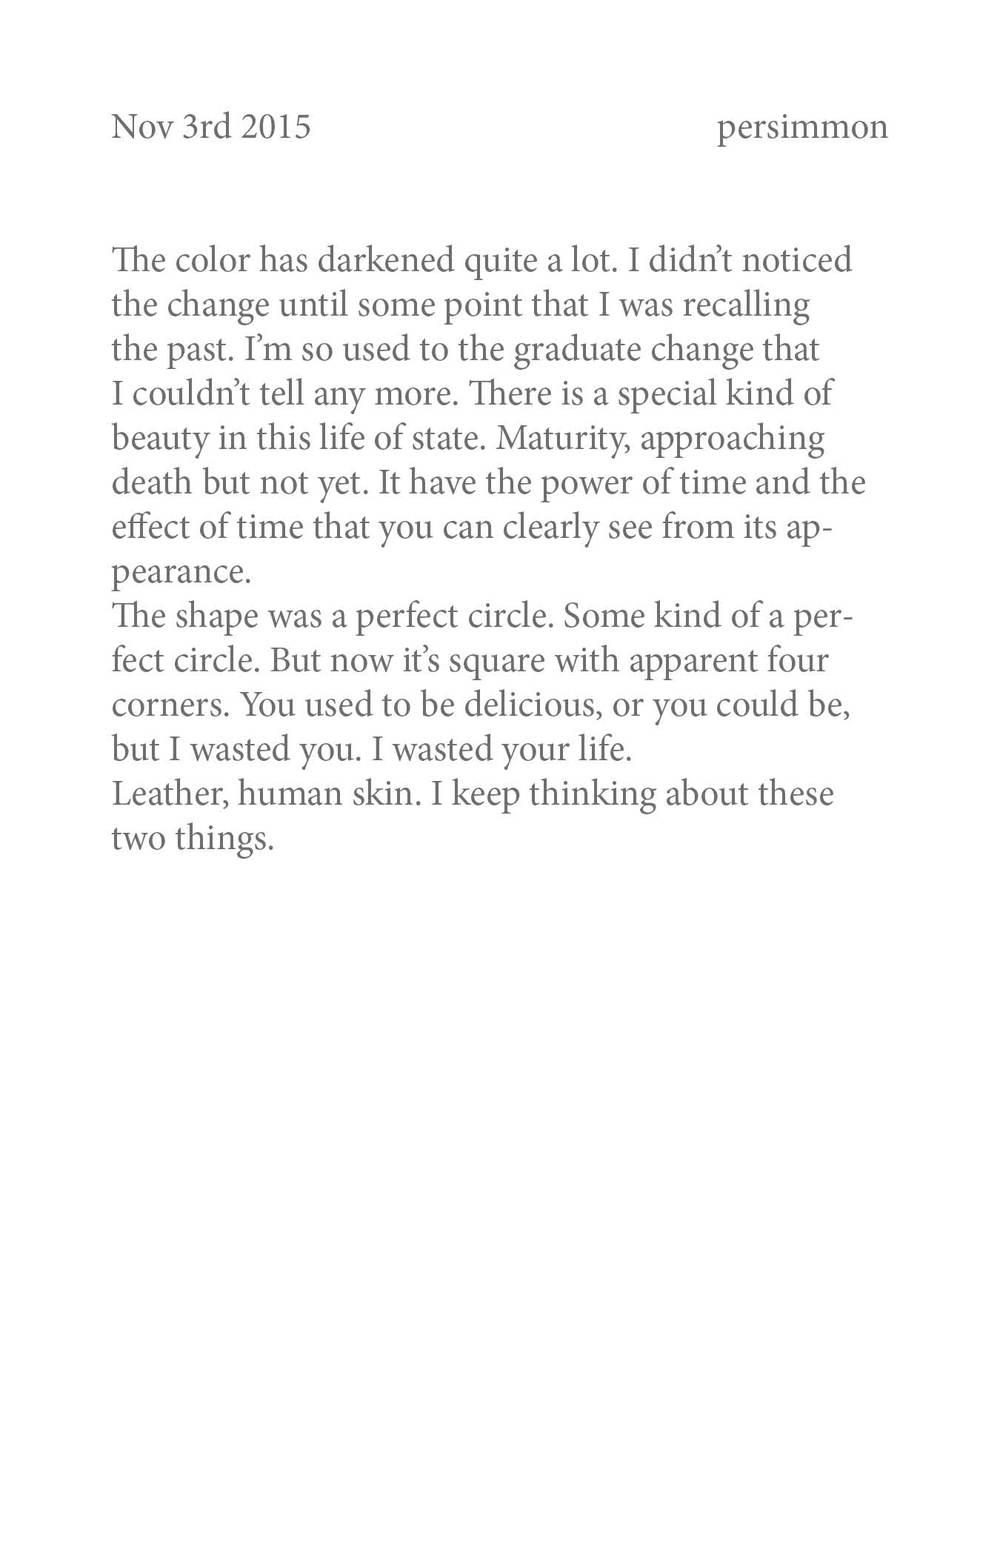 reflection writing_book33.jpg